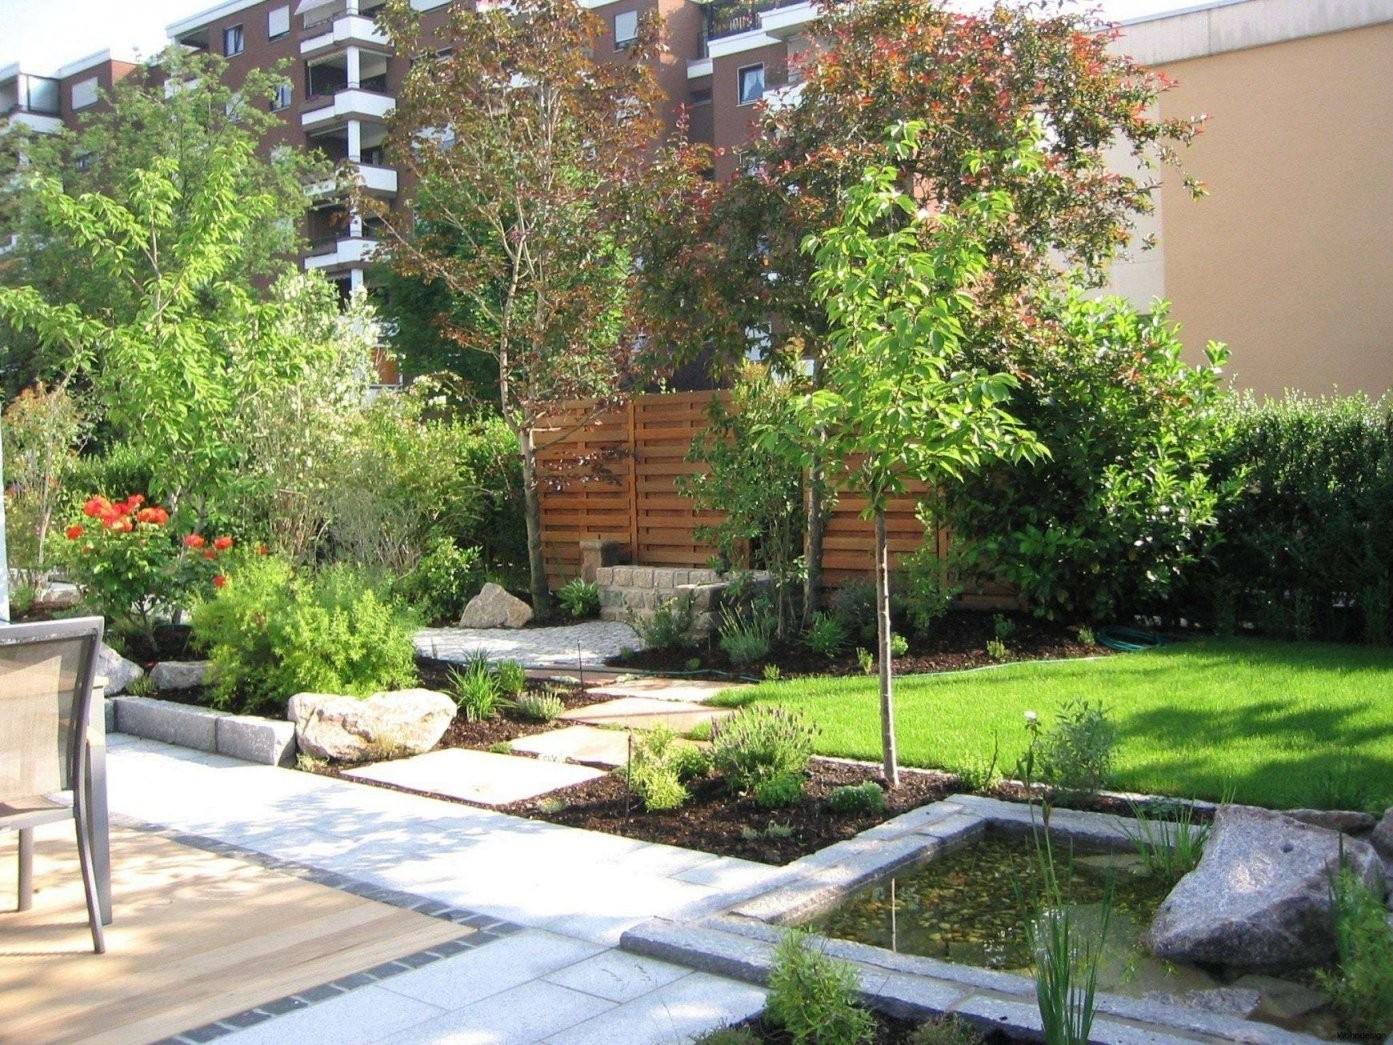 Full Size Moderne Dekoration Idee Wege Garten Und Von Japanische von Japanische Deko Für Garten Bild